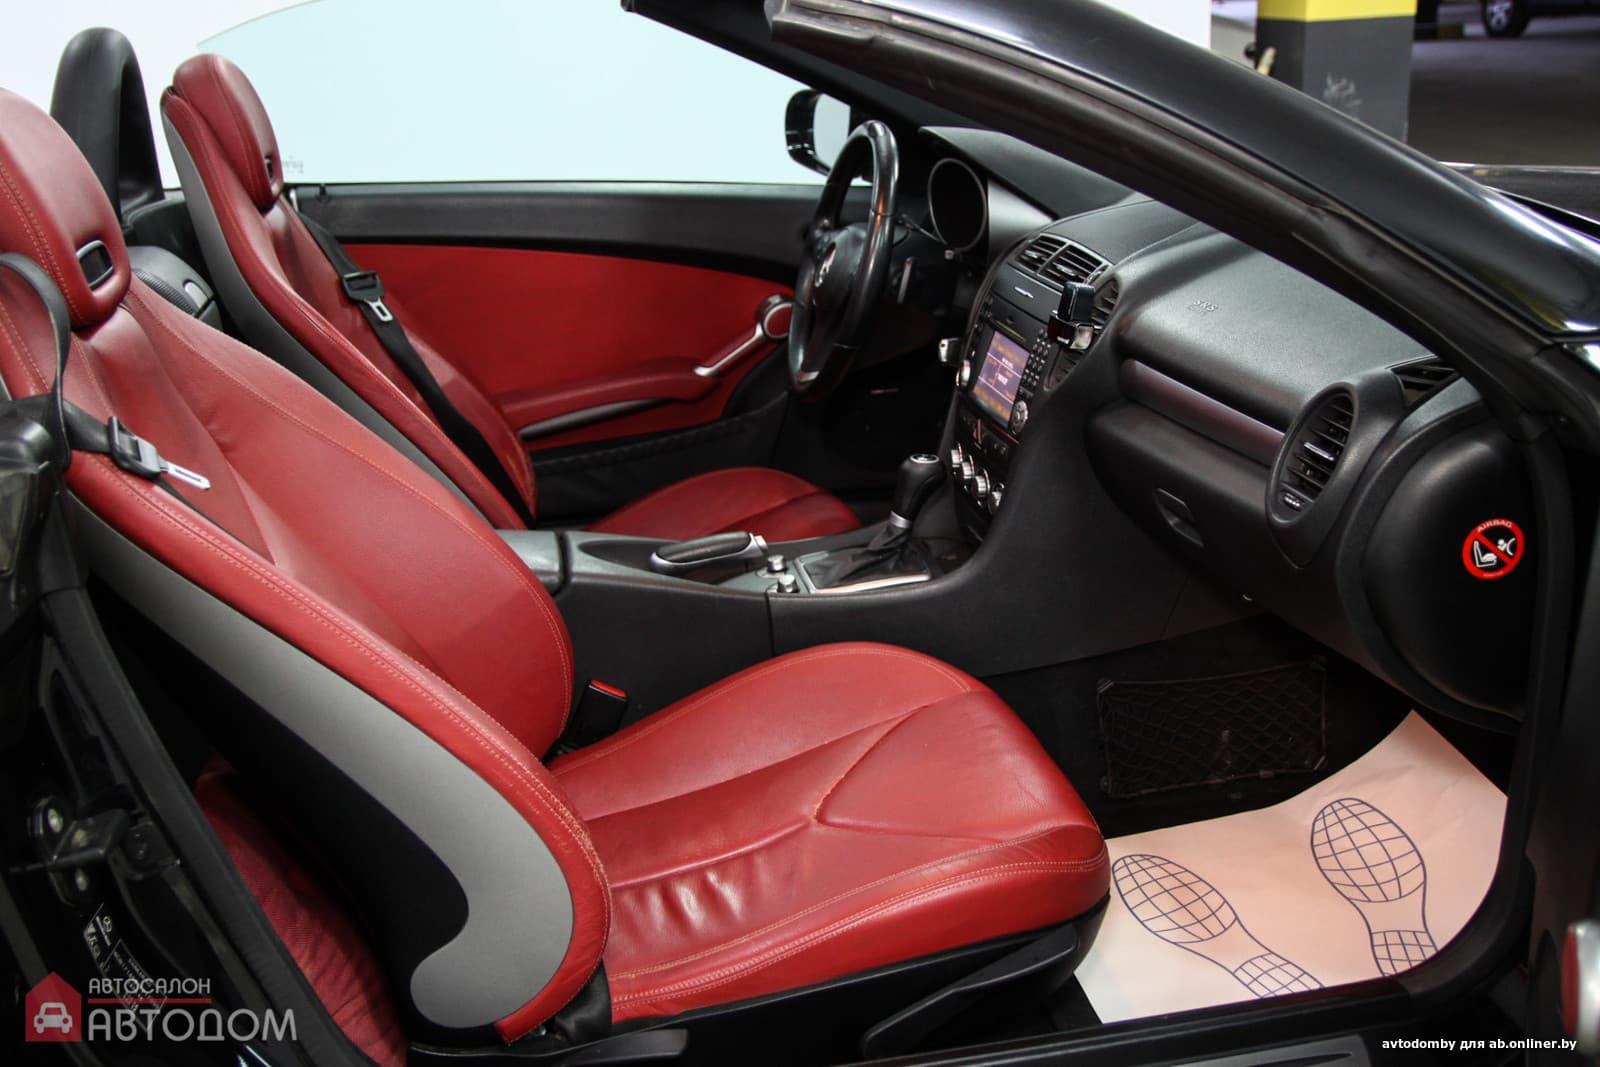 Mercedes-Benz SLK350 350